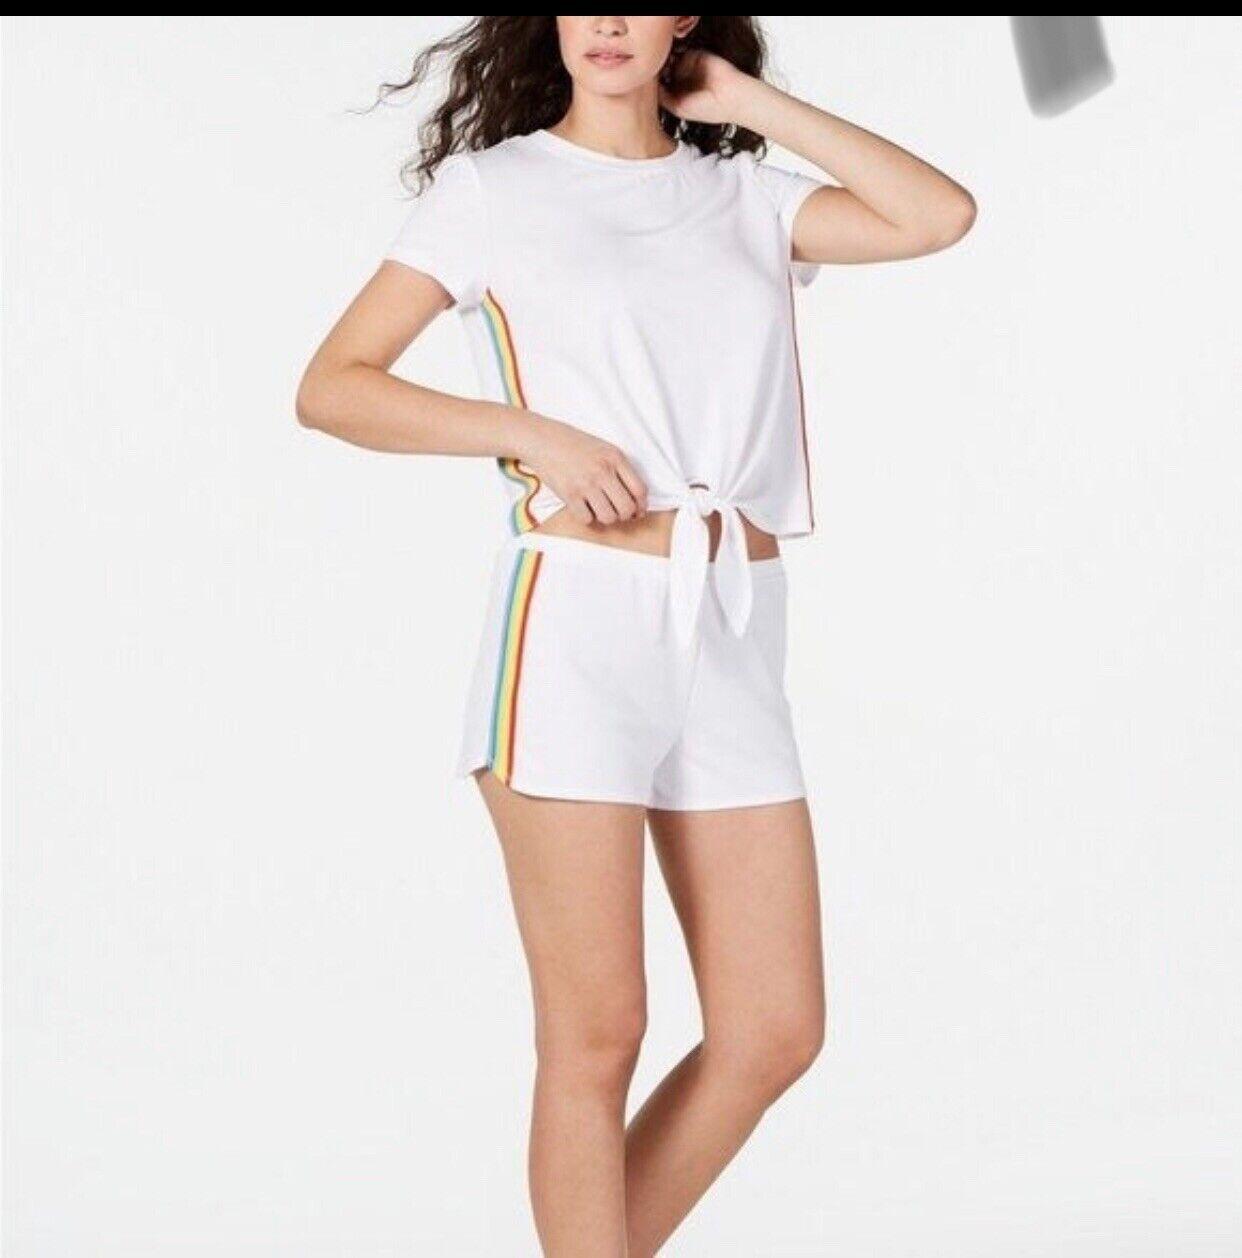 New Catalina Womens Plus-Size Twist Front Bandeau Tankini